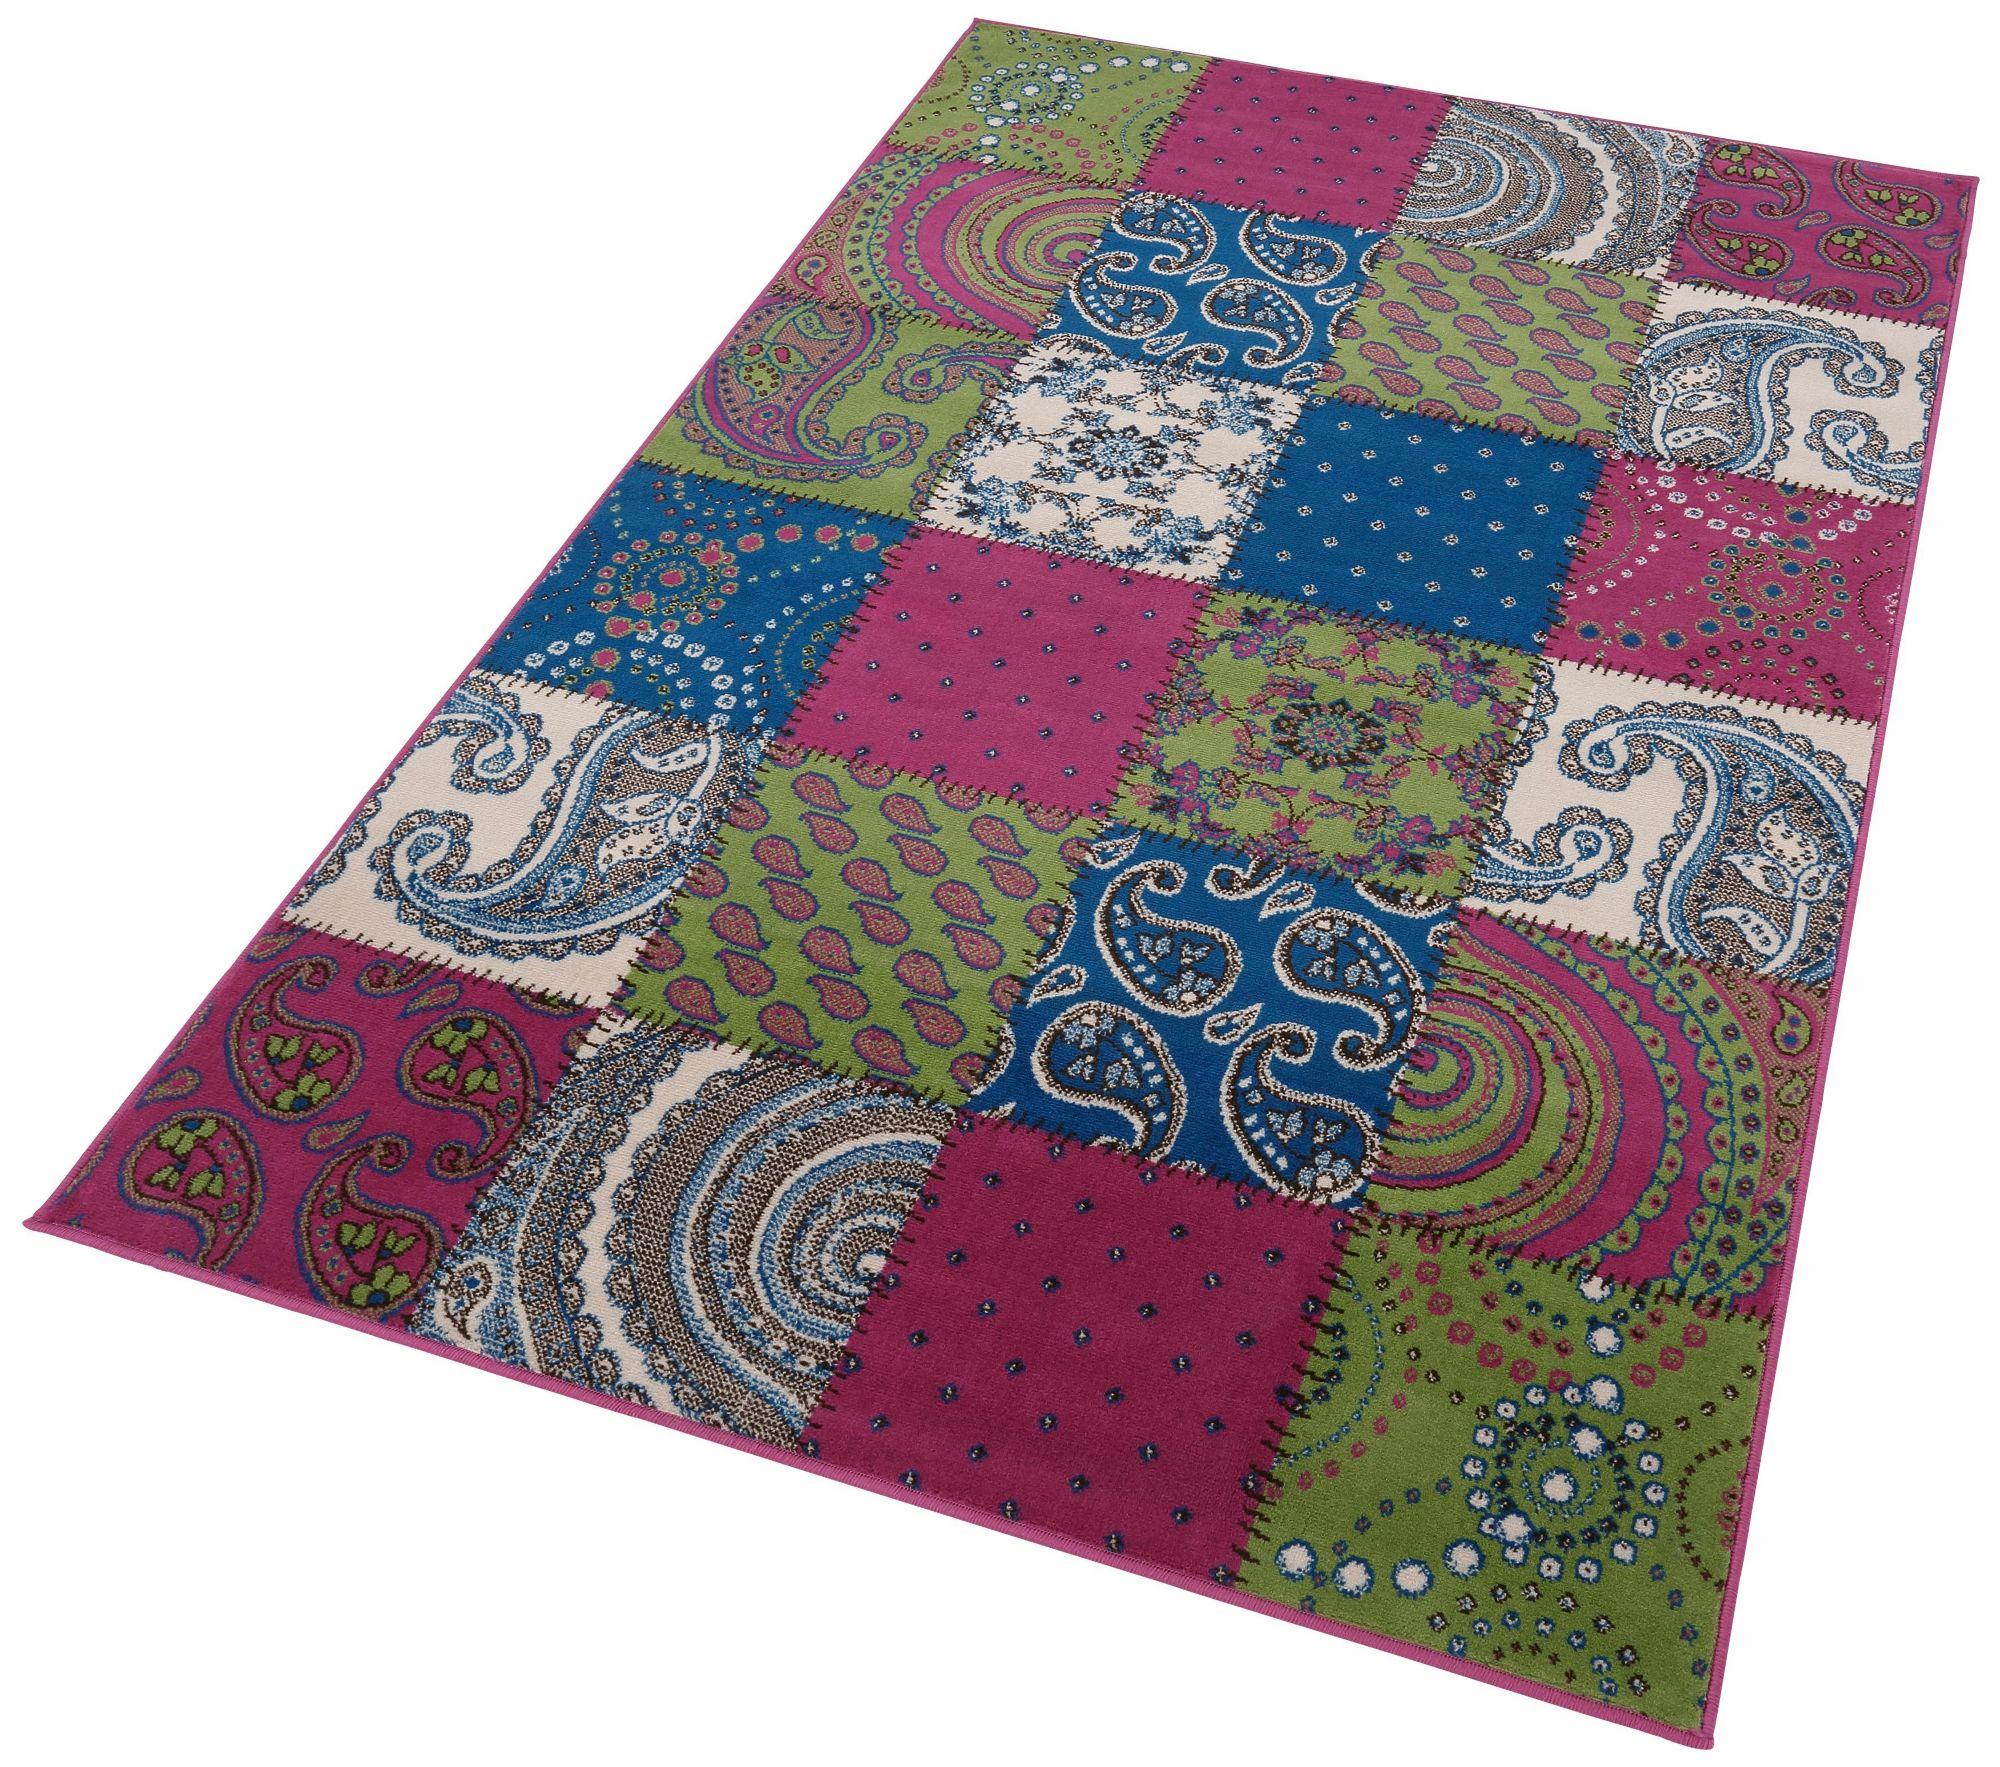 teppich hanse home bord re gewebt patchwork optik bord re schwab versand kurzflor tepp. Black Bedroom Furniture Sets. Home Design Ideas